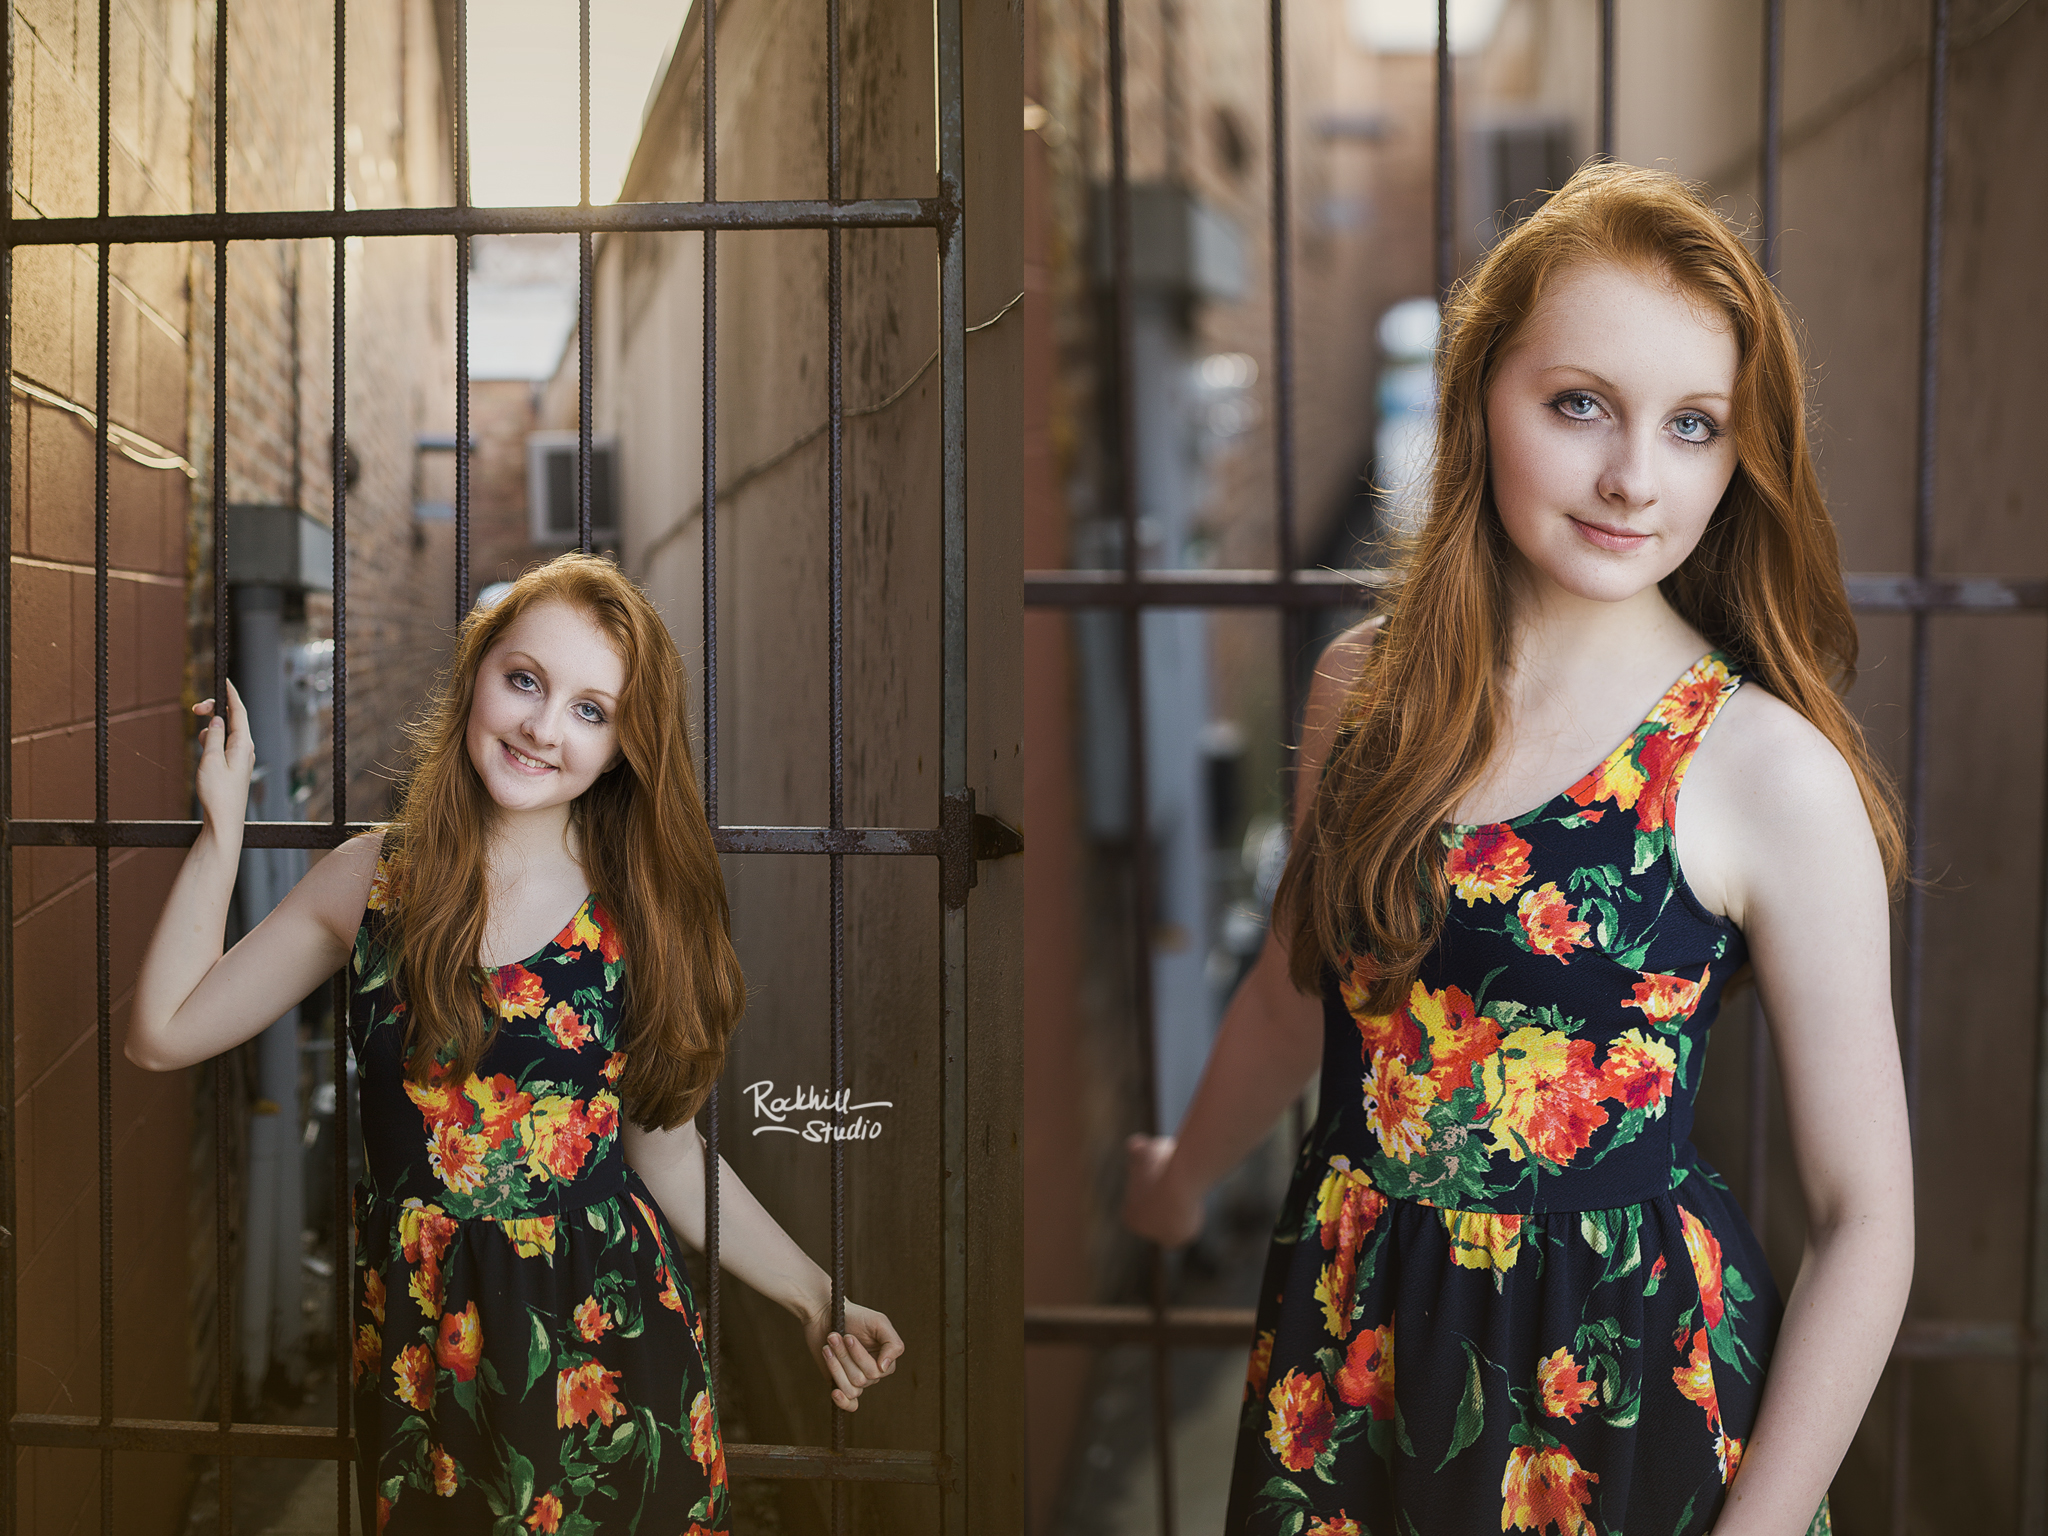 manistique-senior-photographer-upper-peninsula-rockhill-studio-michigan-girl-urban3.jpg